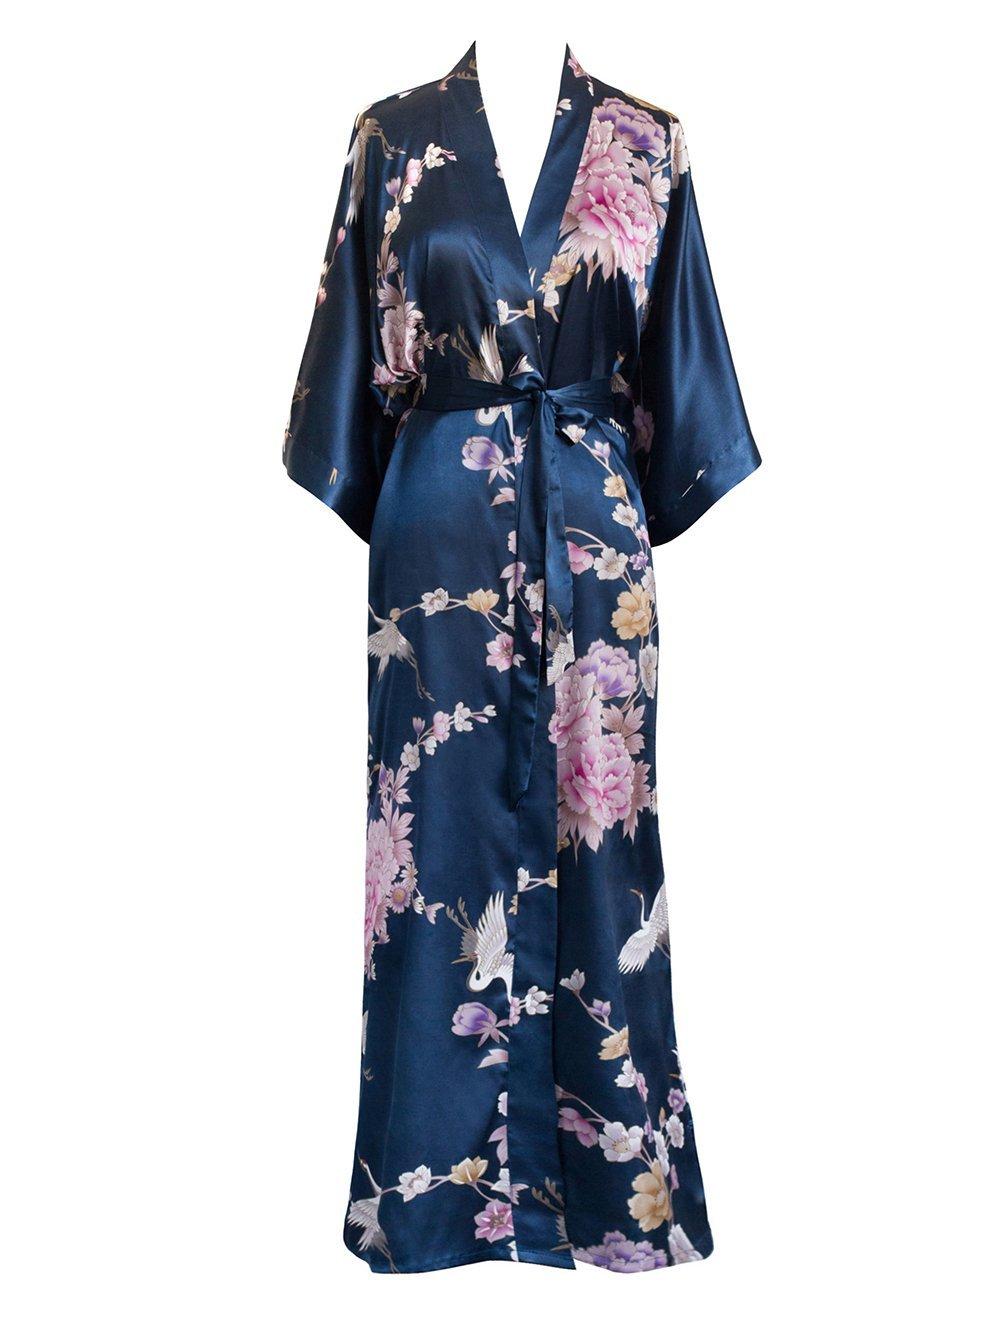 Old Shanghai Women's Kimono Long Robe - Chrysanthemum & Crane (Navy)